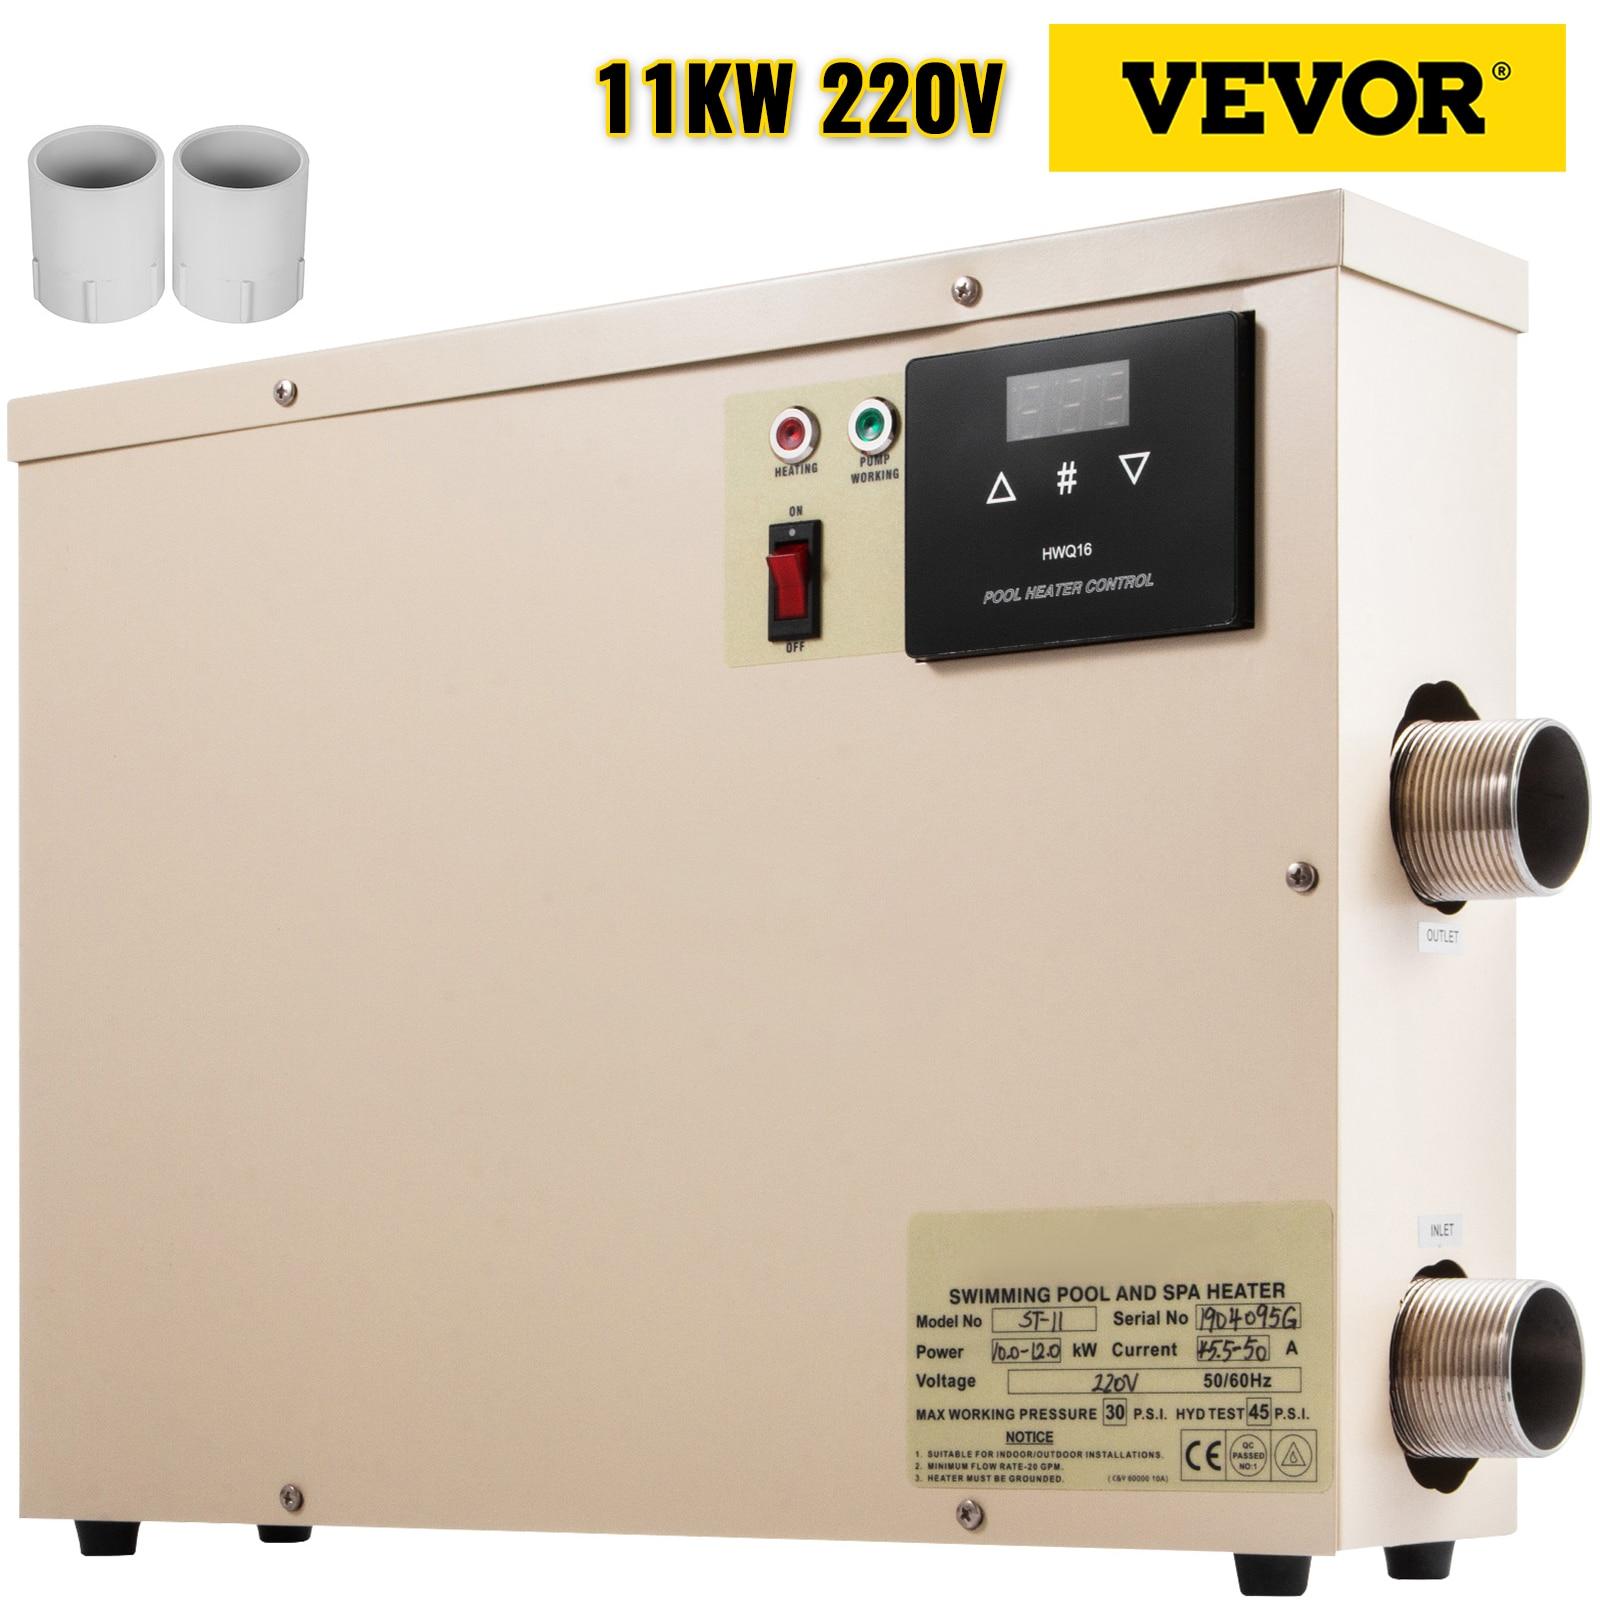 VEVOR جهاز تدفئة المسبح 11KW 220 فولت سبا سخان مياه كهربي مضخة صالح لل ماكس 7.5 CBM بركة معدات سخان المياه ترموستات